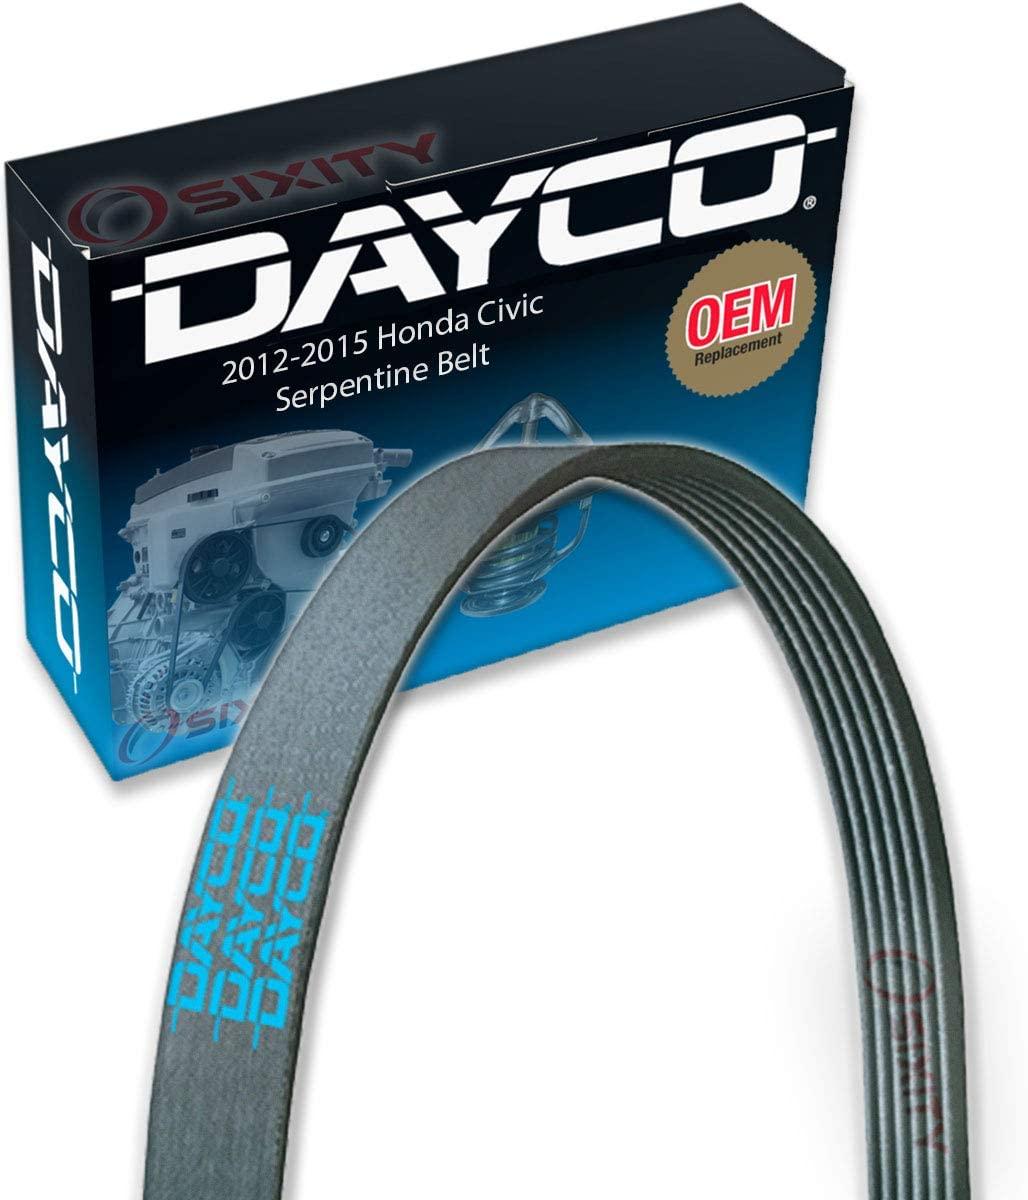 Dayco Serpentine Belt for 2012-2015 Honda Civic 1.8L L4 - V Belt Ribbed Accessory Drive